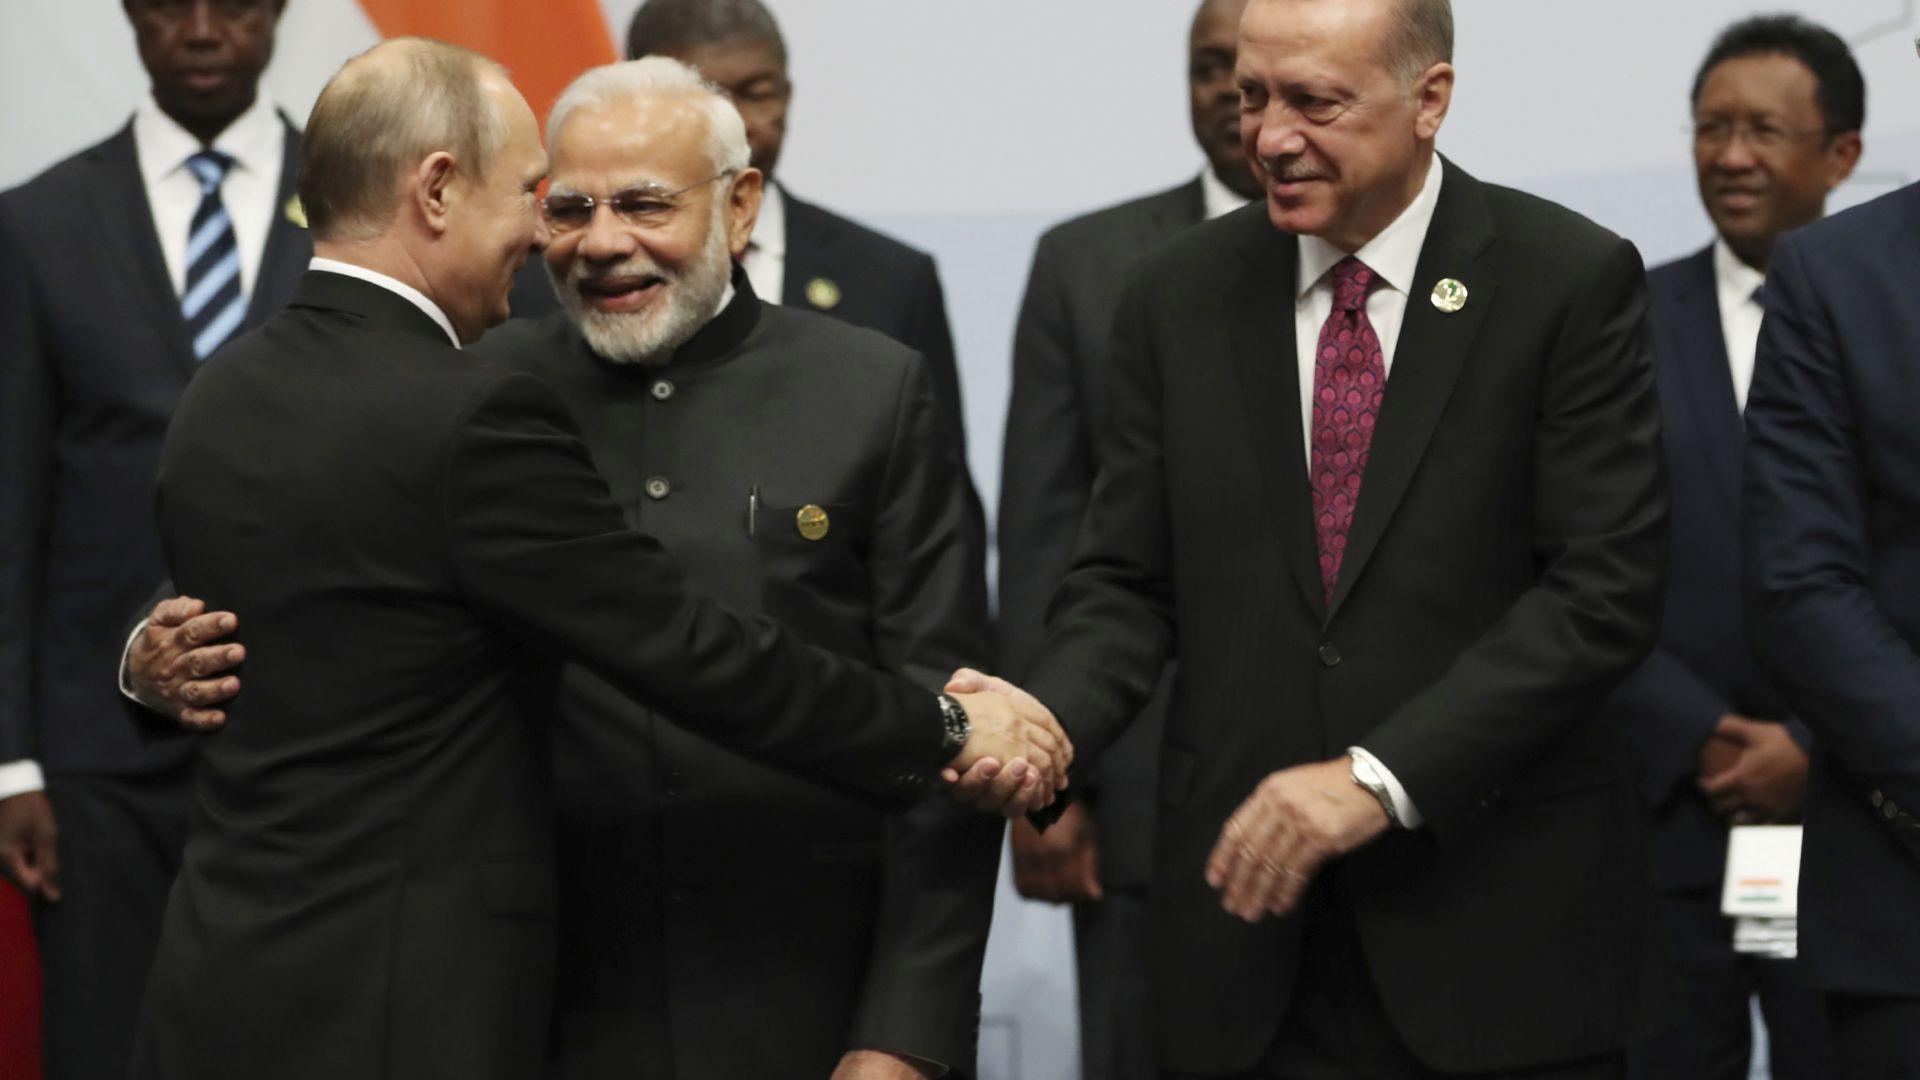 Ердоган иска Турция в БРИКС